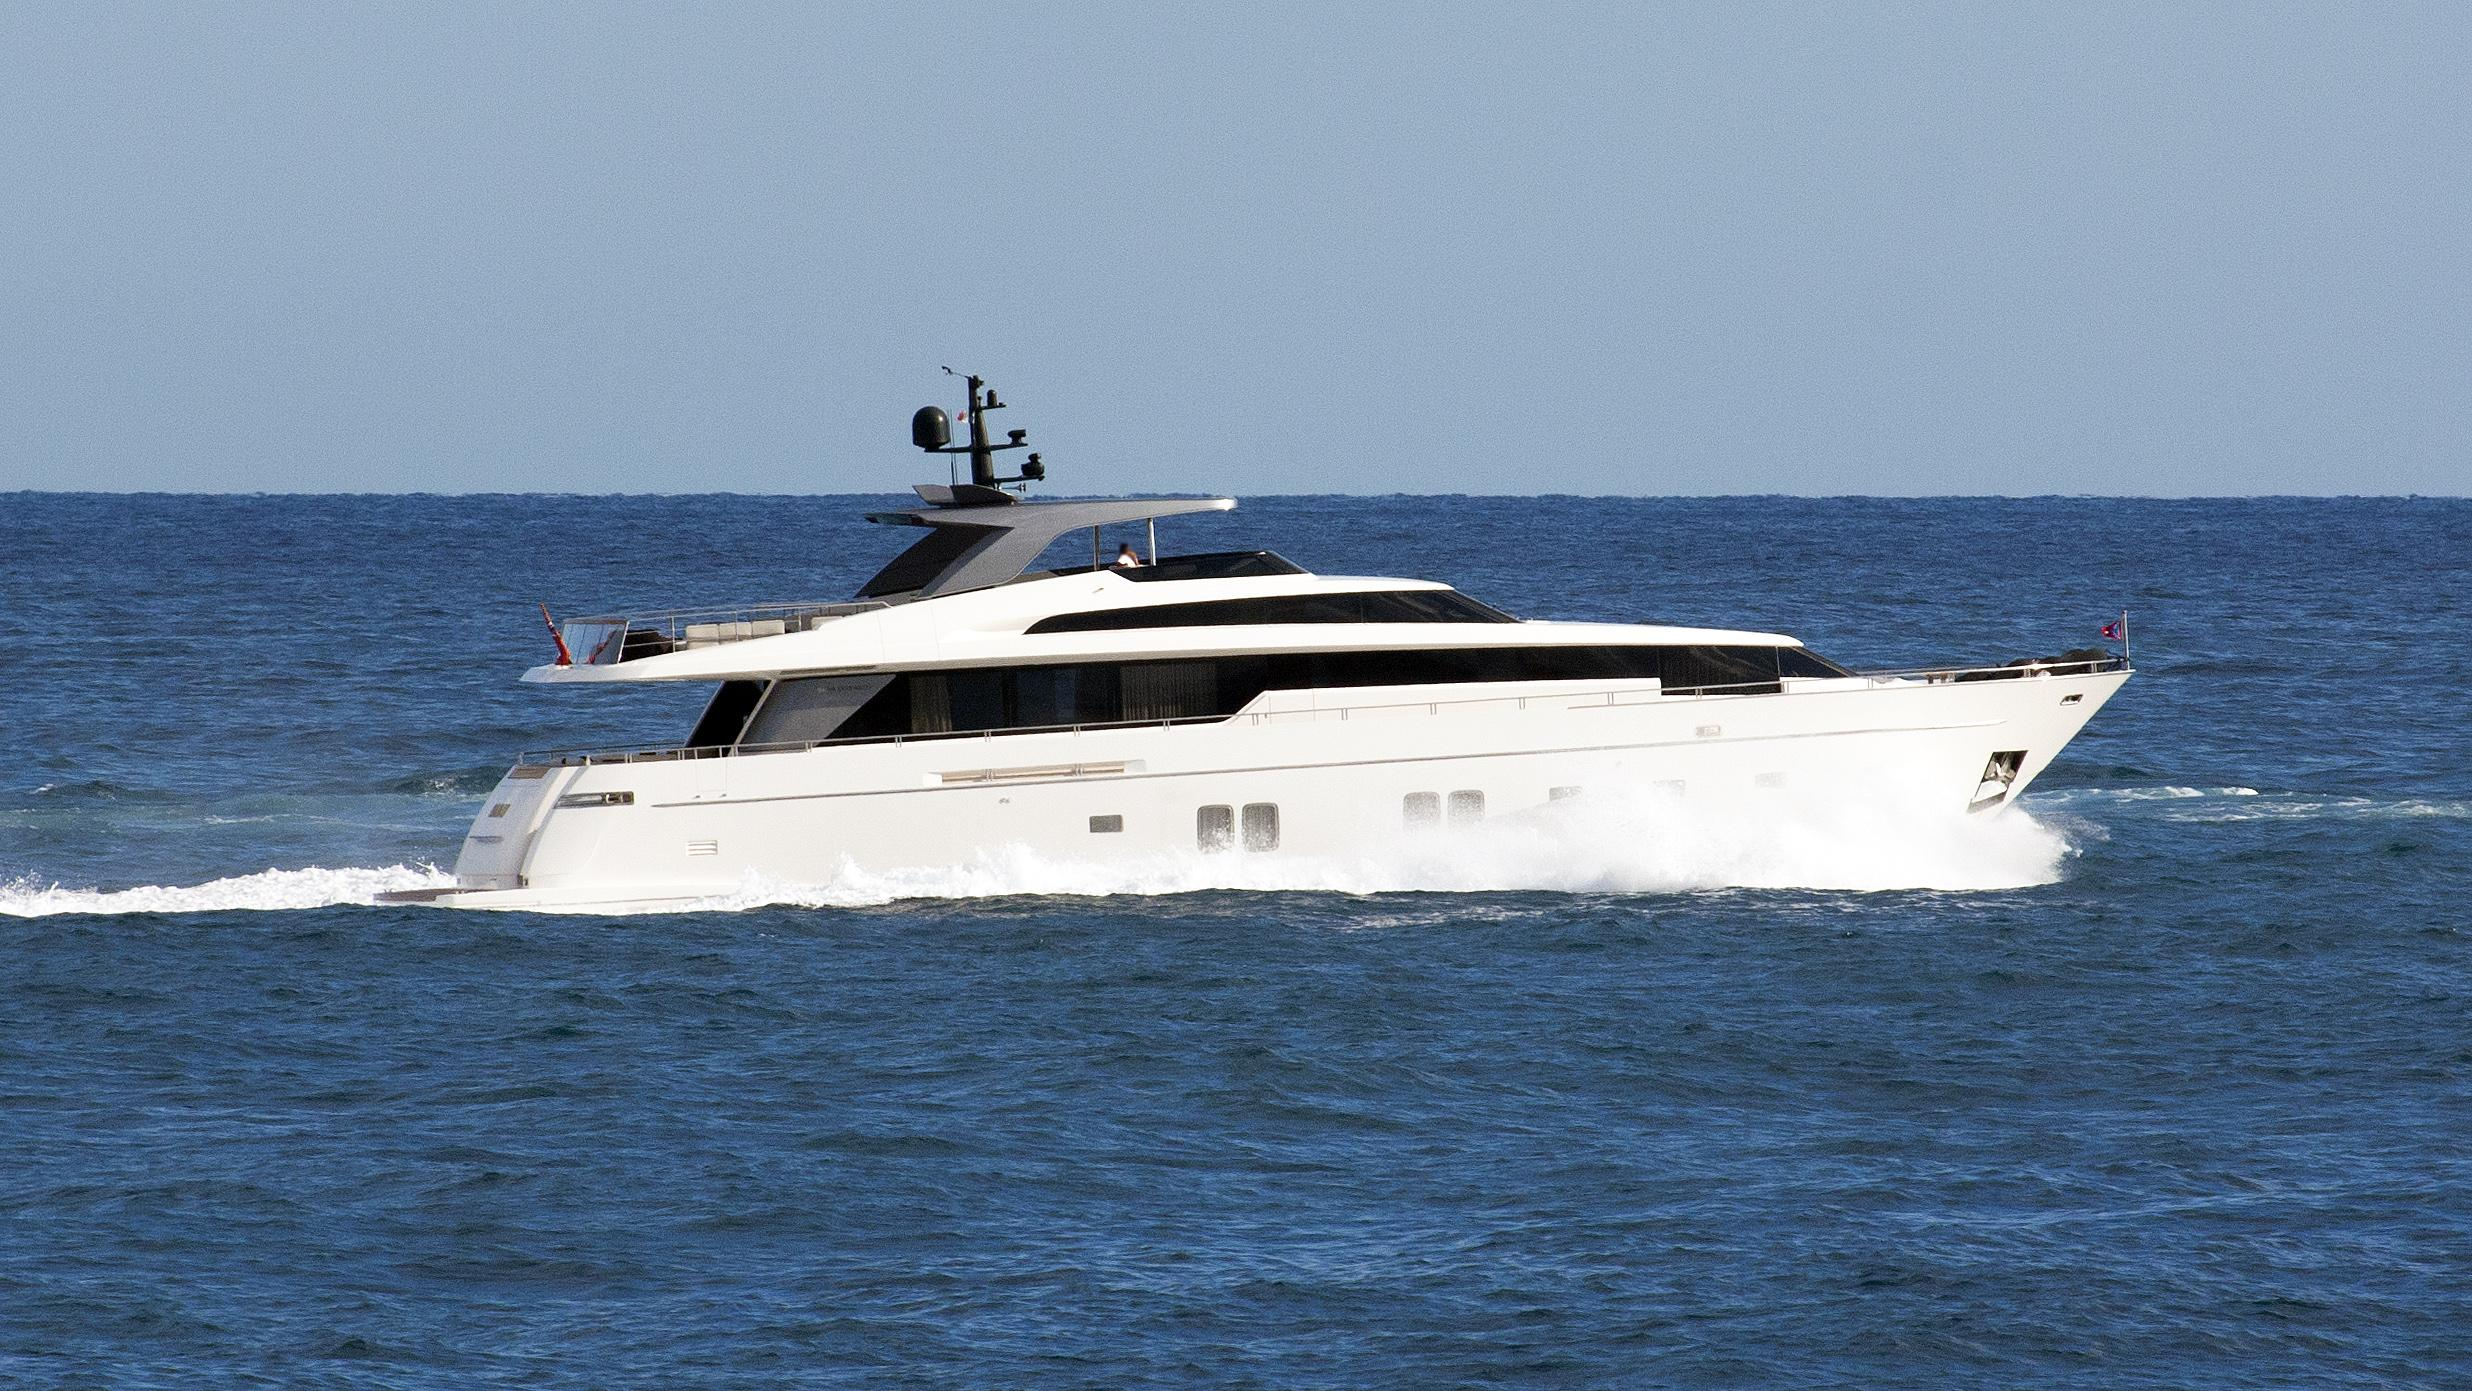 mamay-motor-yacht-sanlorenzo-sl-104-2012-32m-half-profile